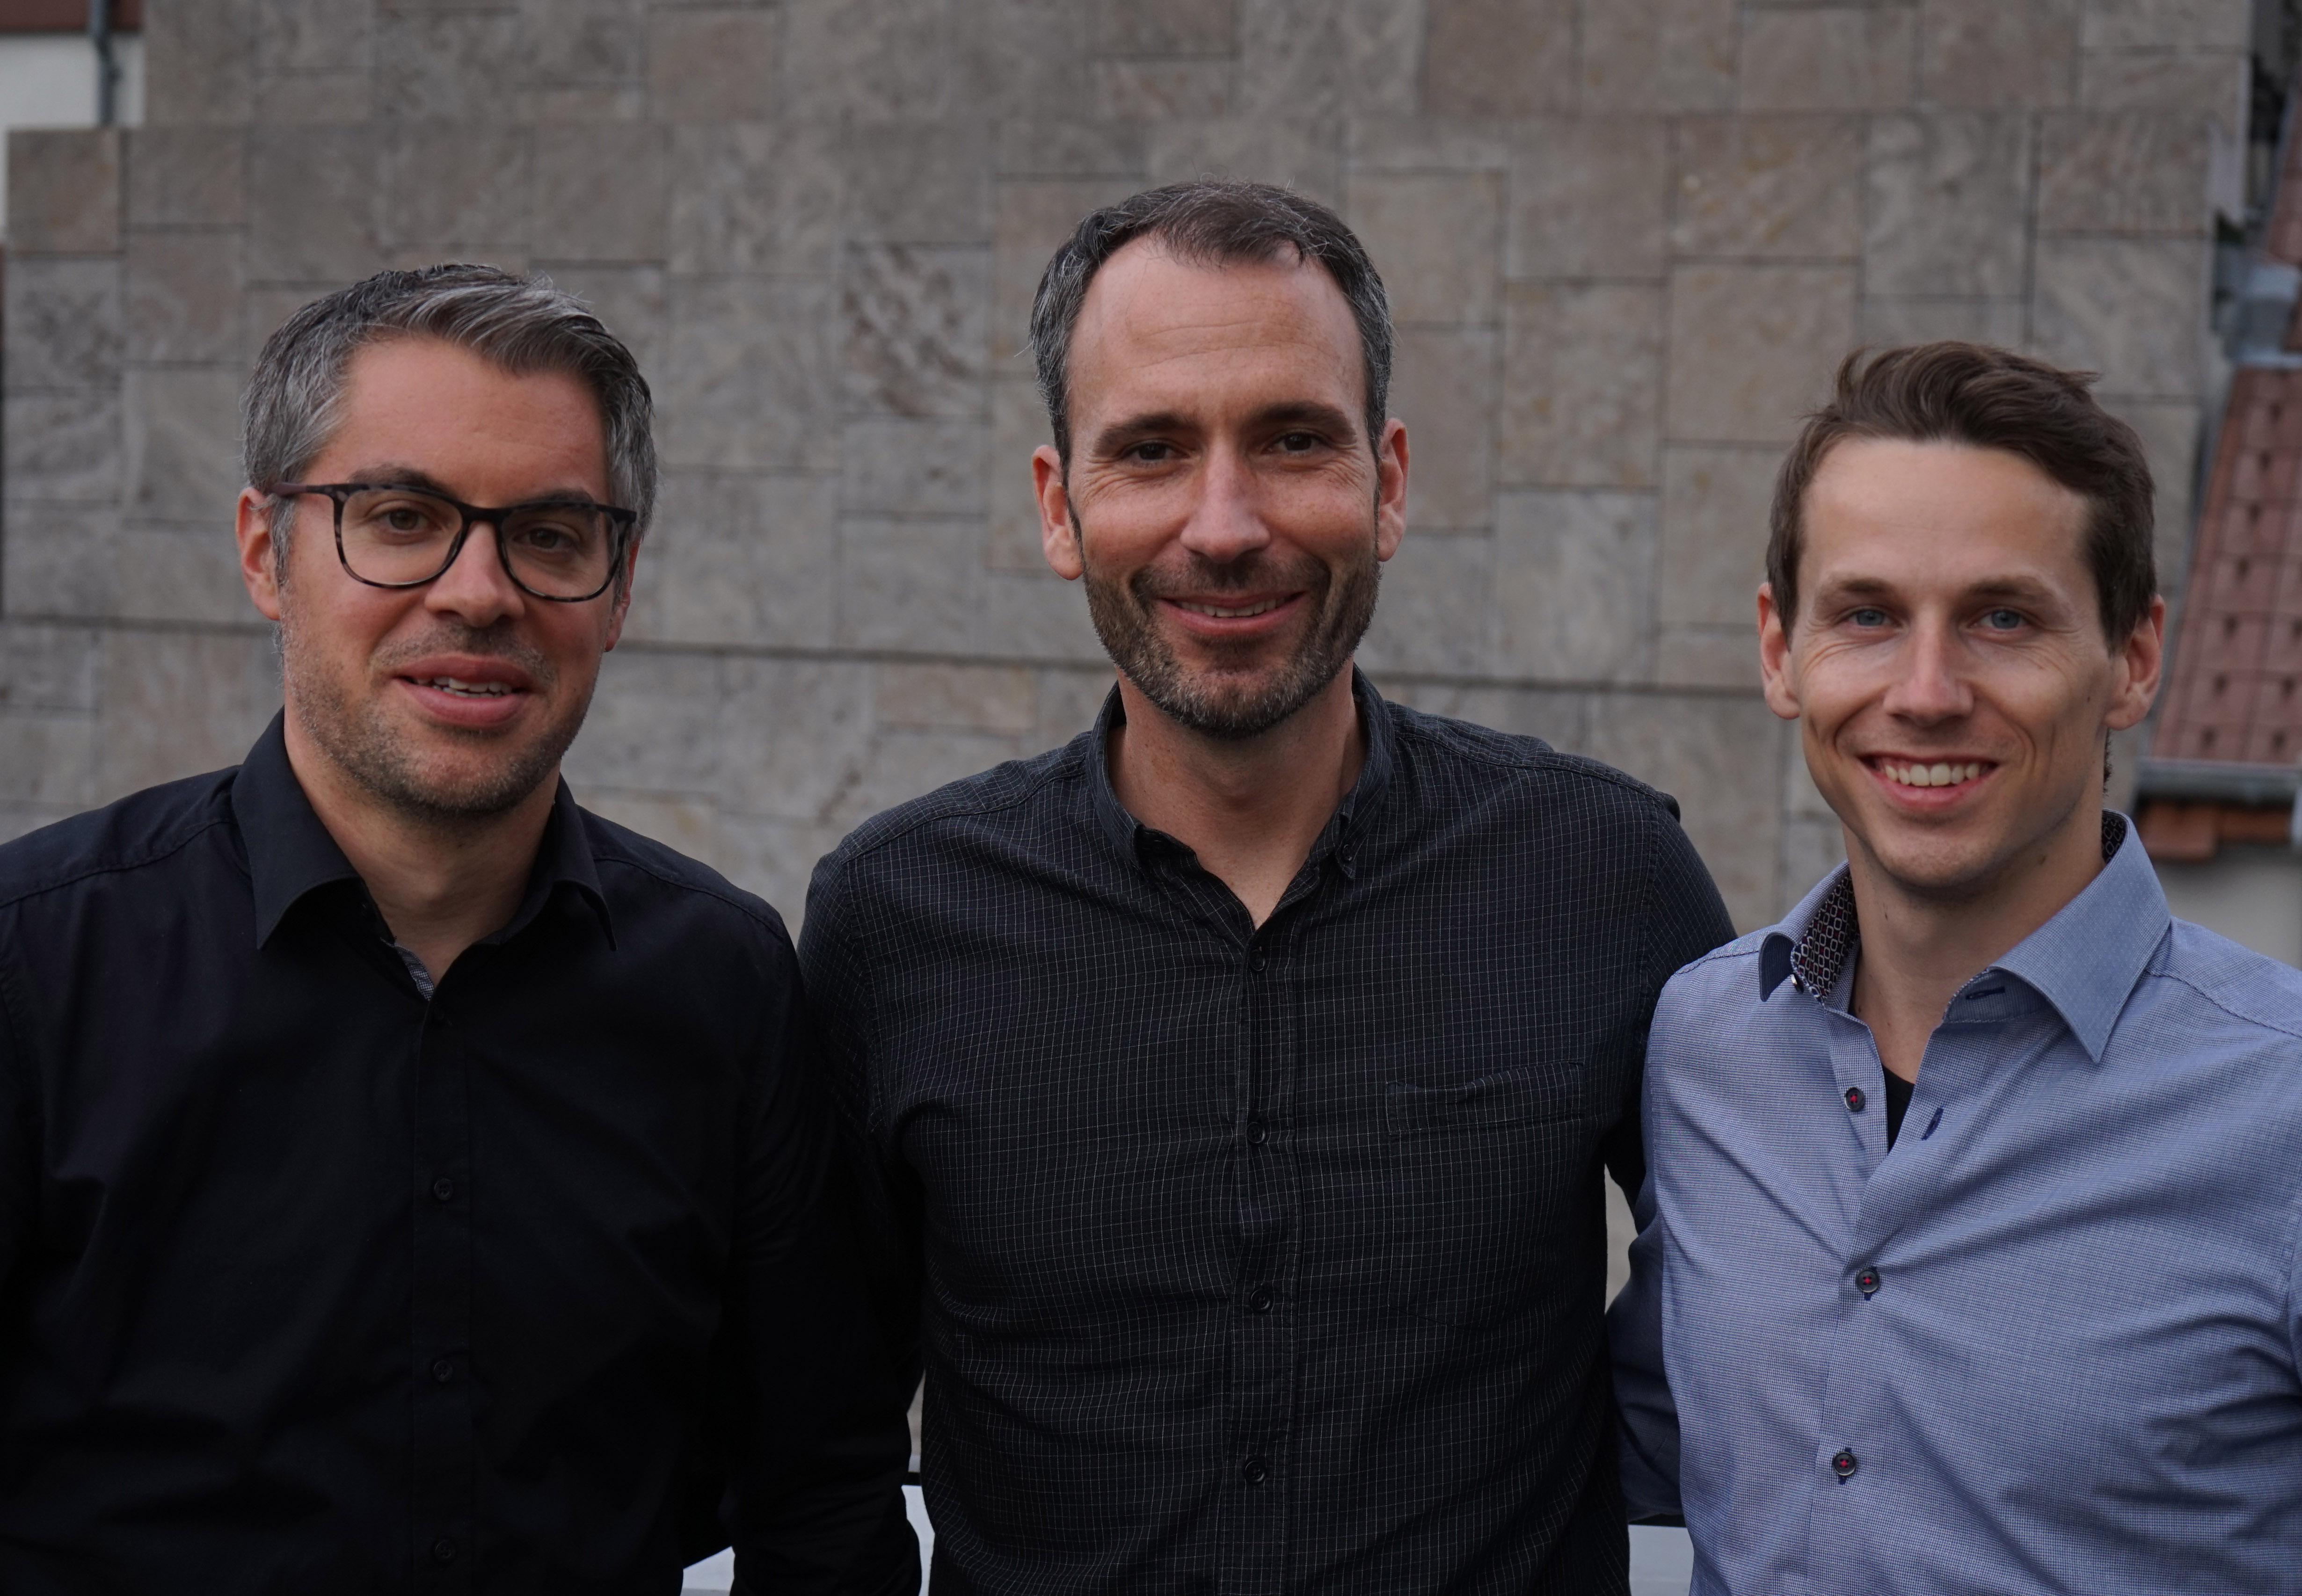 (v.l.n.r.) Michael Frank, Alexander Nicolai, Michael Schüppel